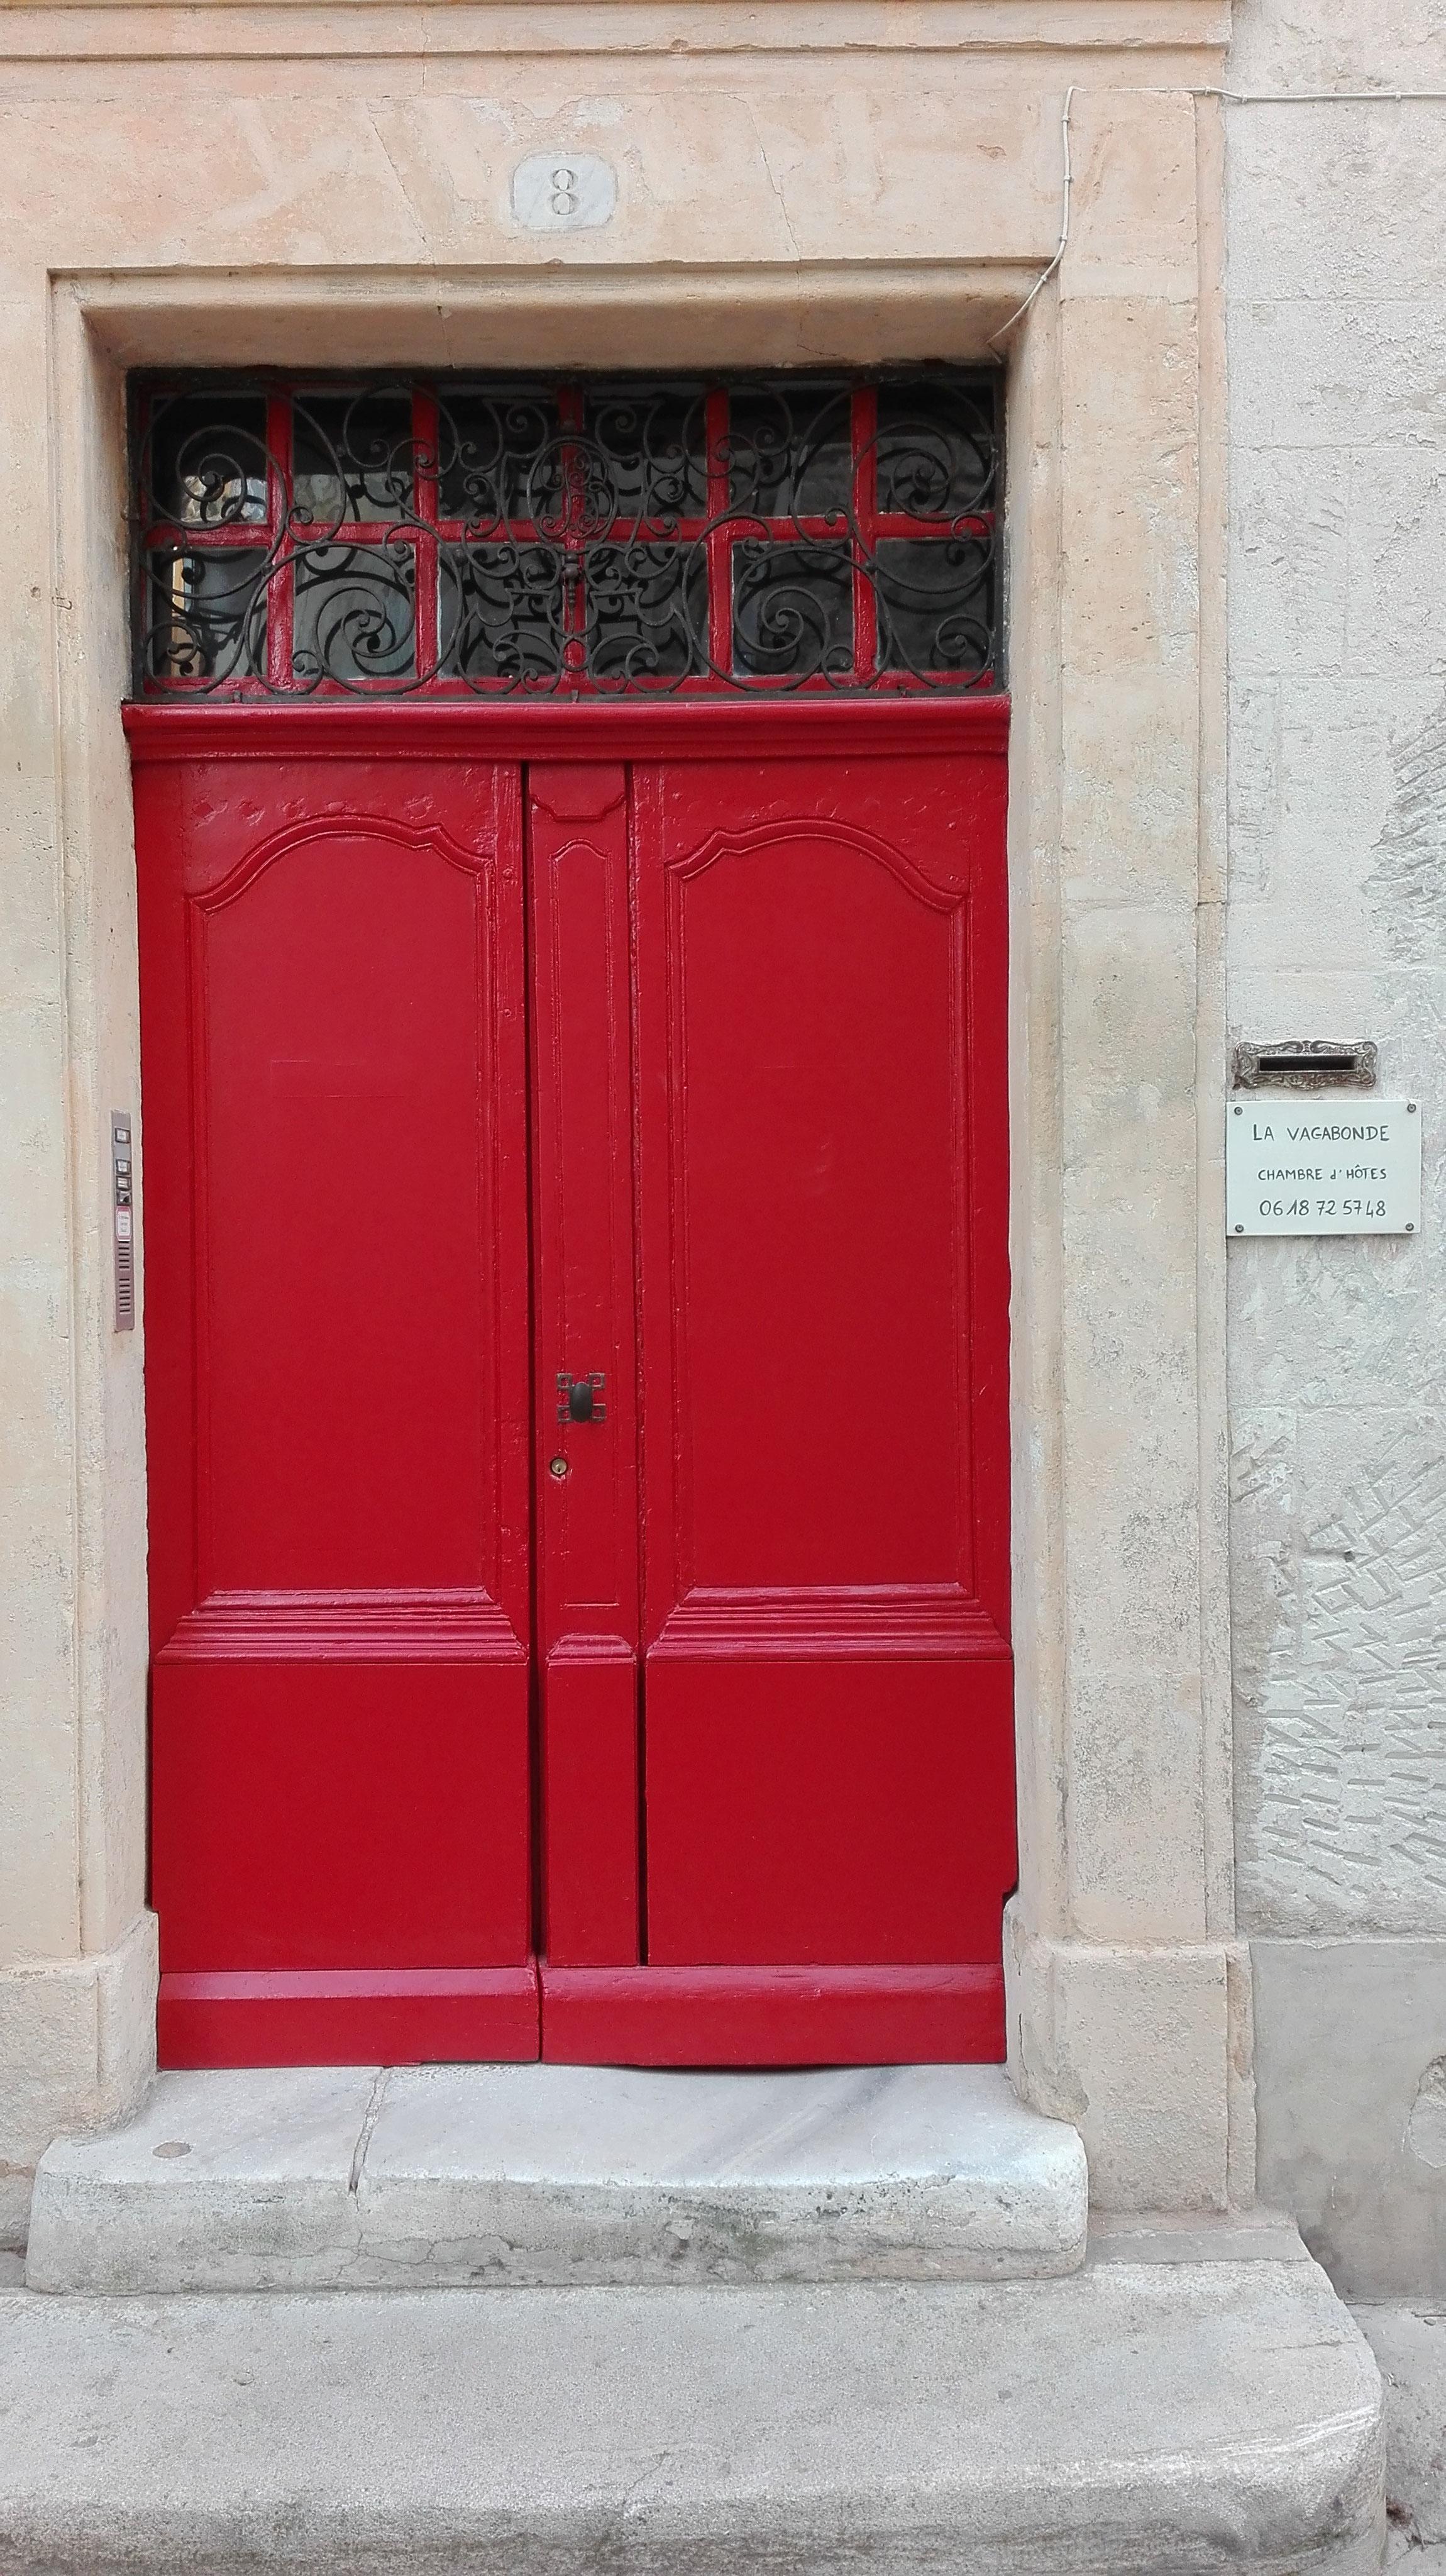 bed and breakfast La Vagabonde Arles chambre d hotes Camargue